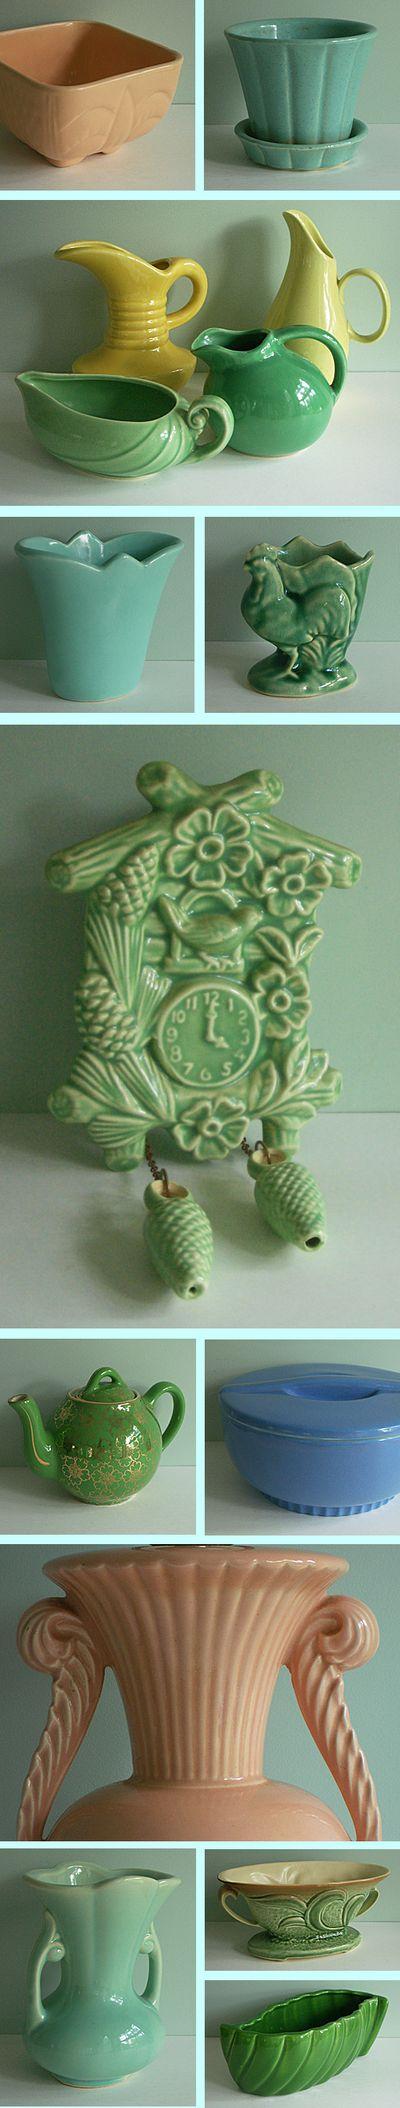 PotteryMosaic